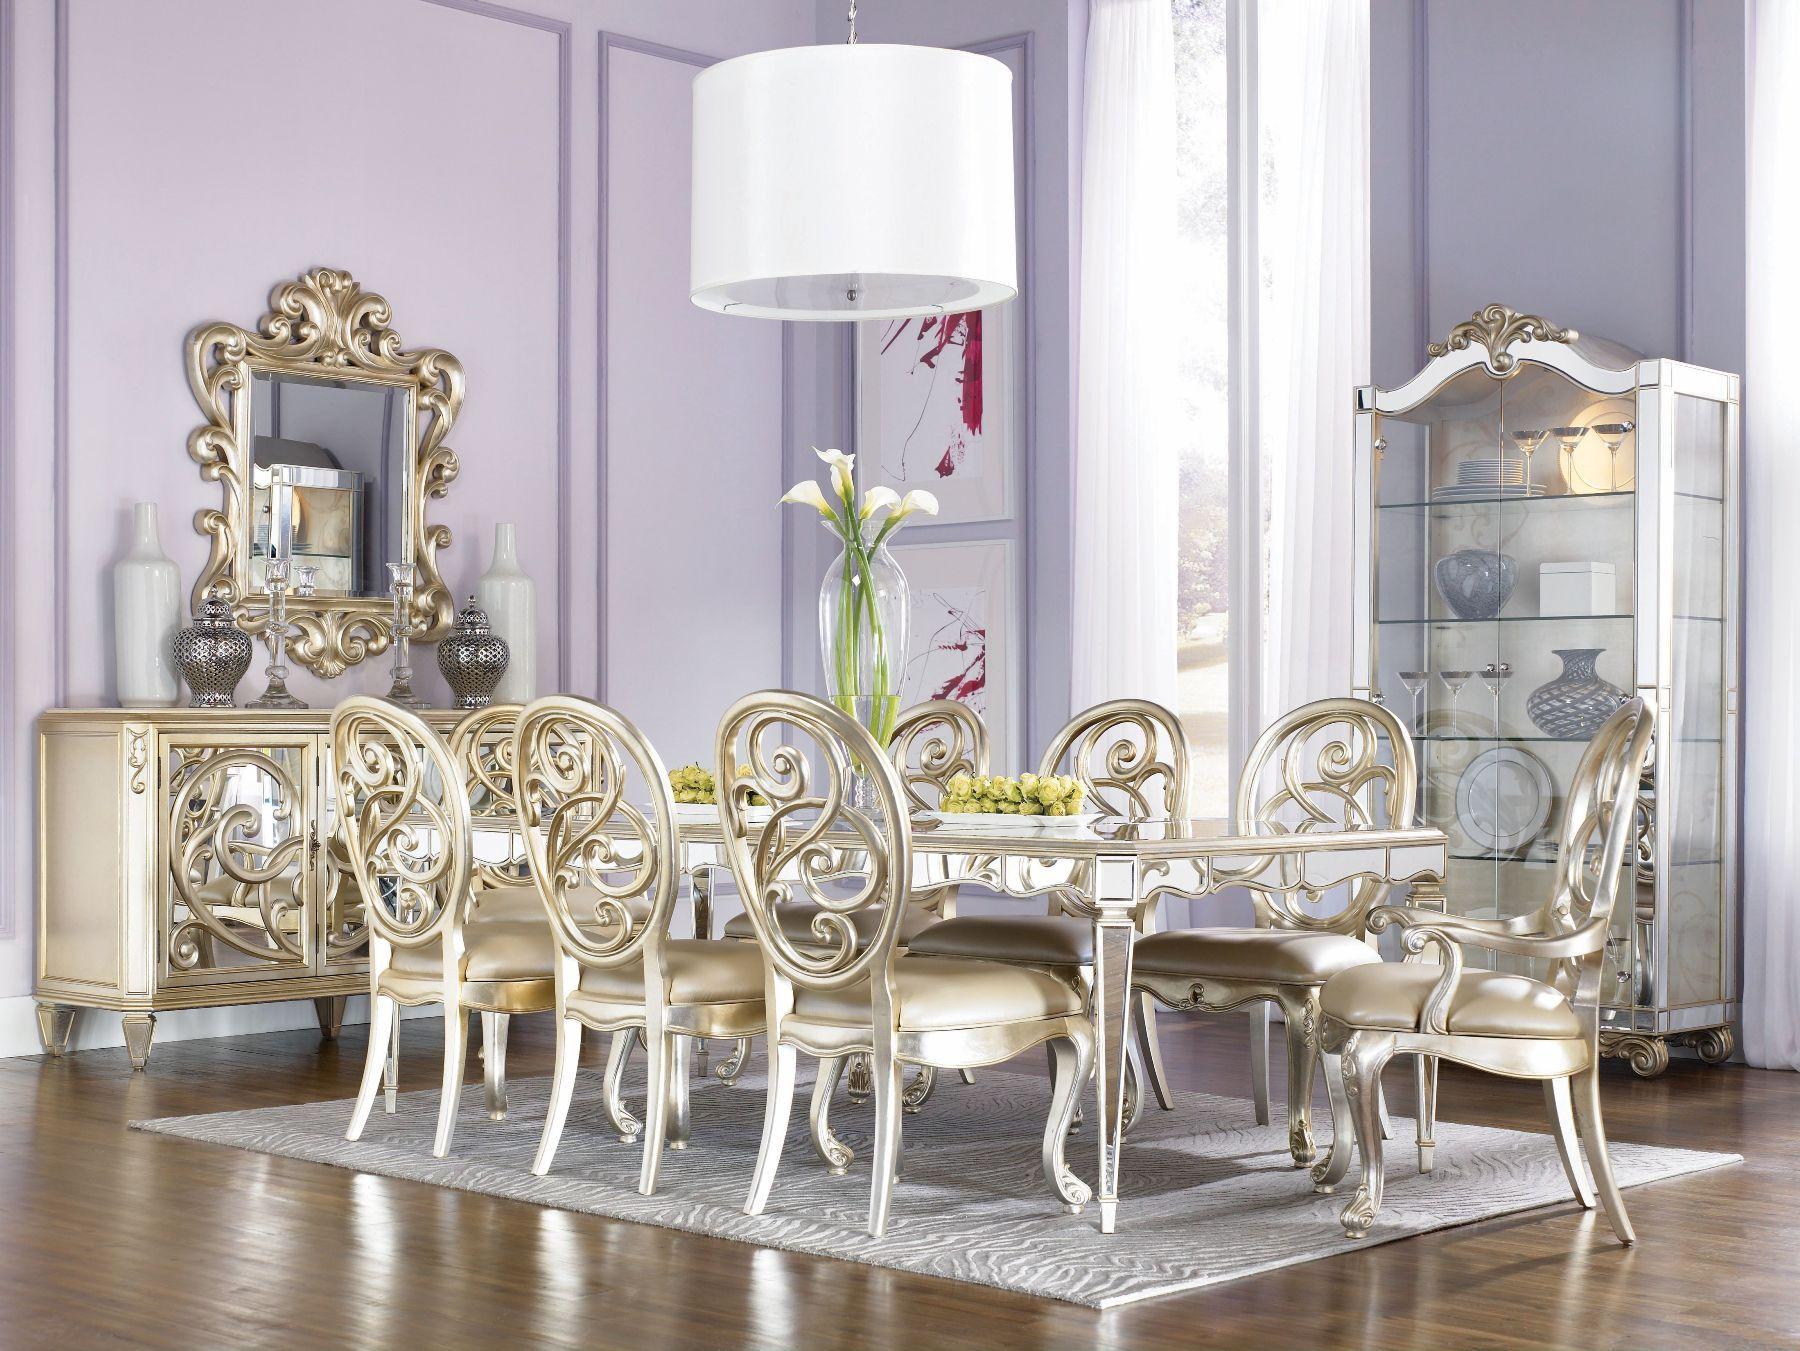 Wonderful White Drum Shade Pendant Lamp Over Silver Iron Venetian ...